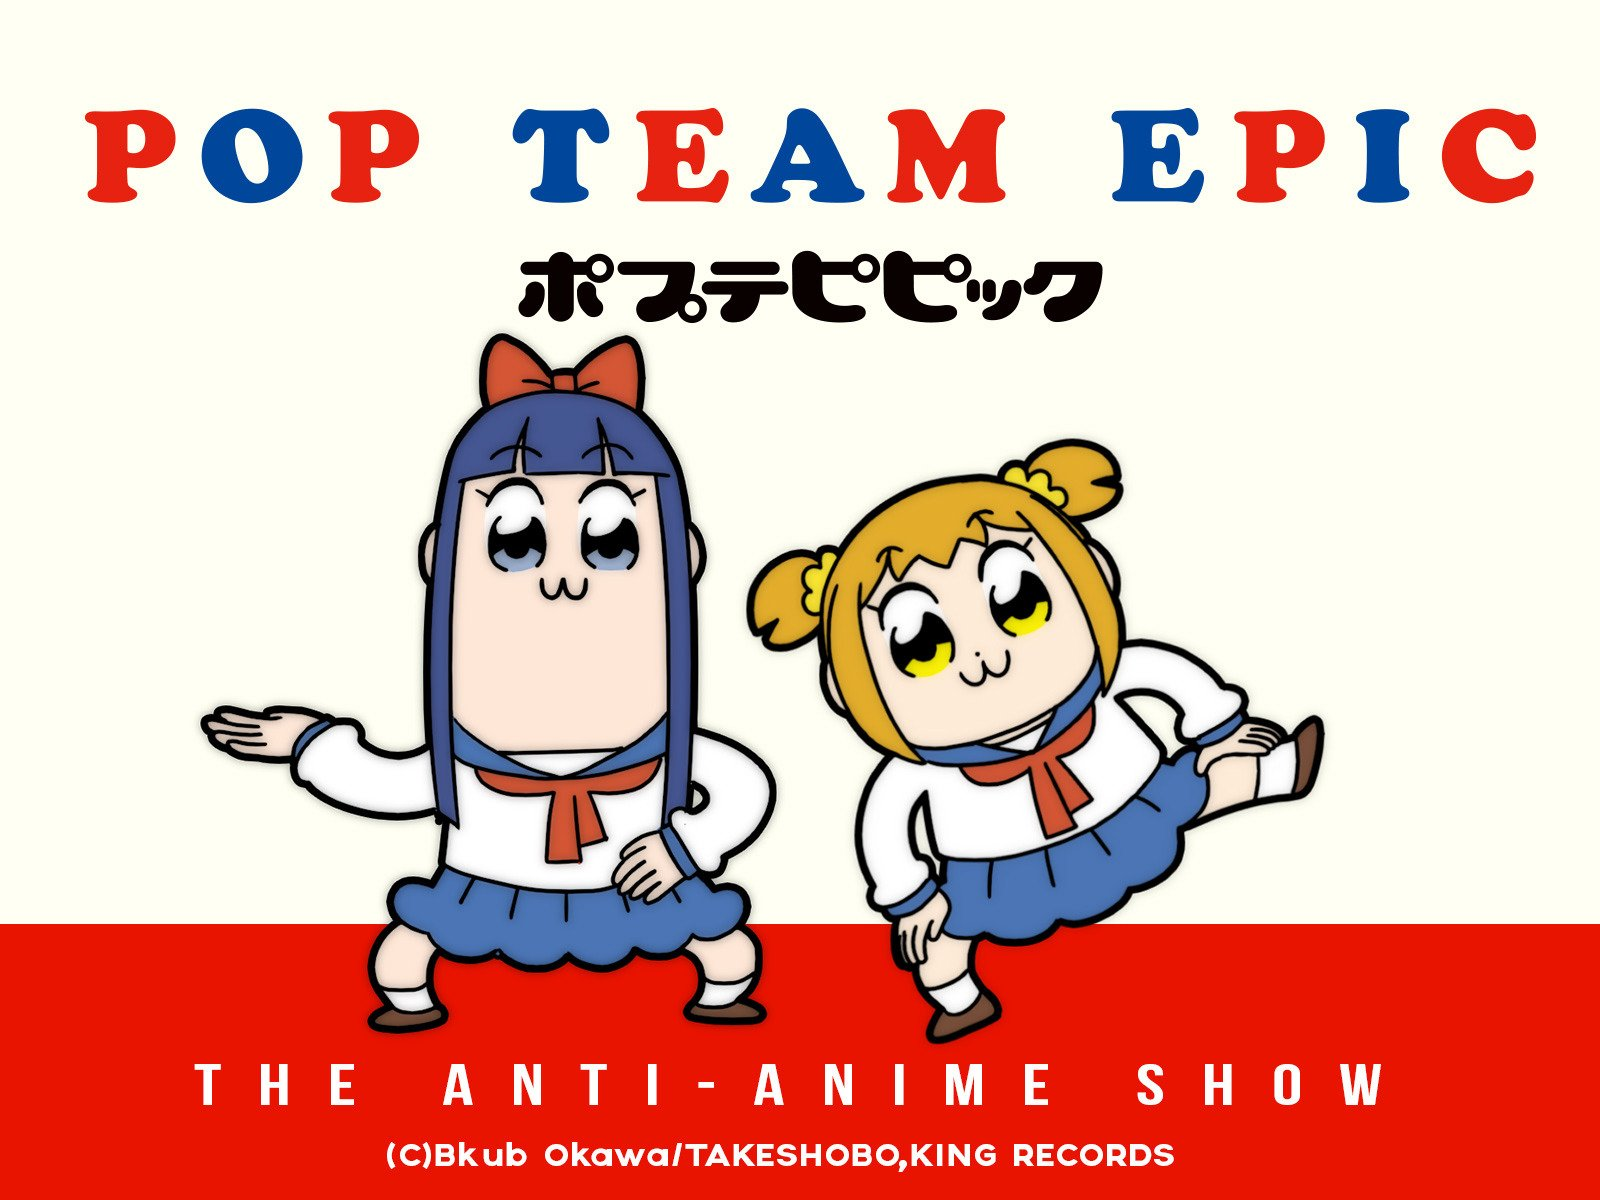 Amazon Pop Team Epic Hochu Otsuka Masashi Ebara Noriko Hidaka Yuji Mitsuya Jun Aoki Digital Services LLC